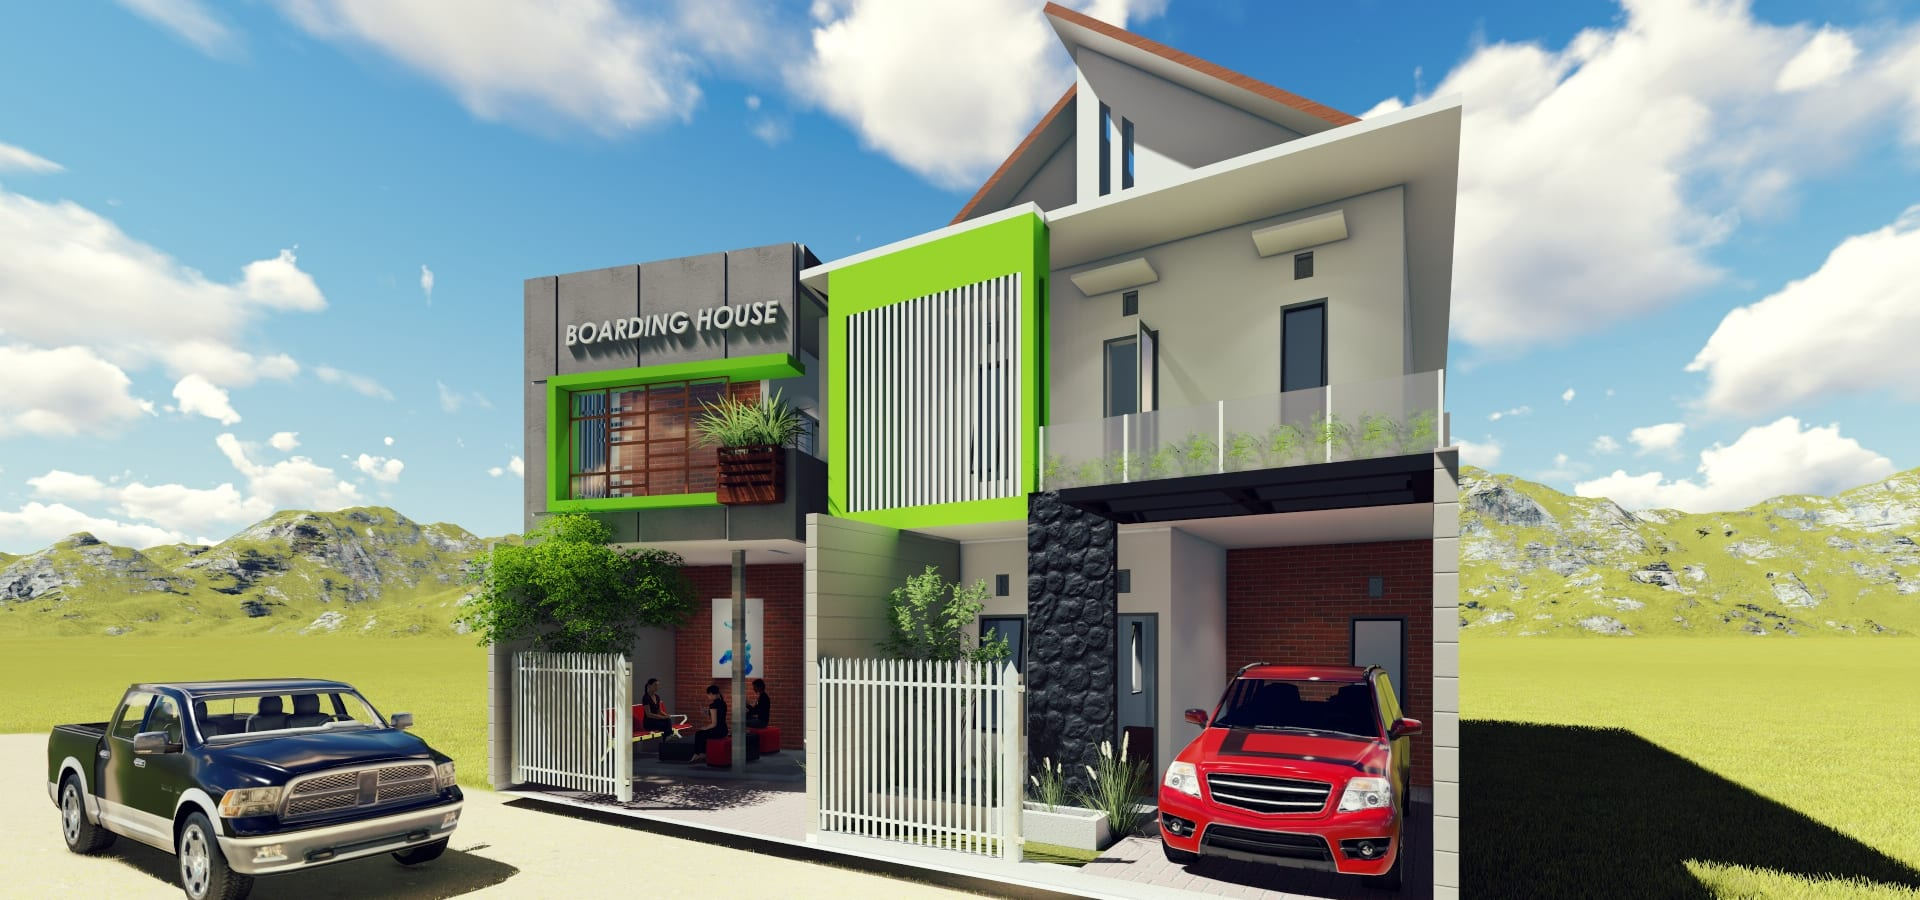 APARCH architecture and design